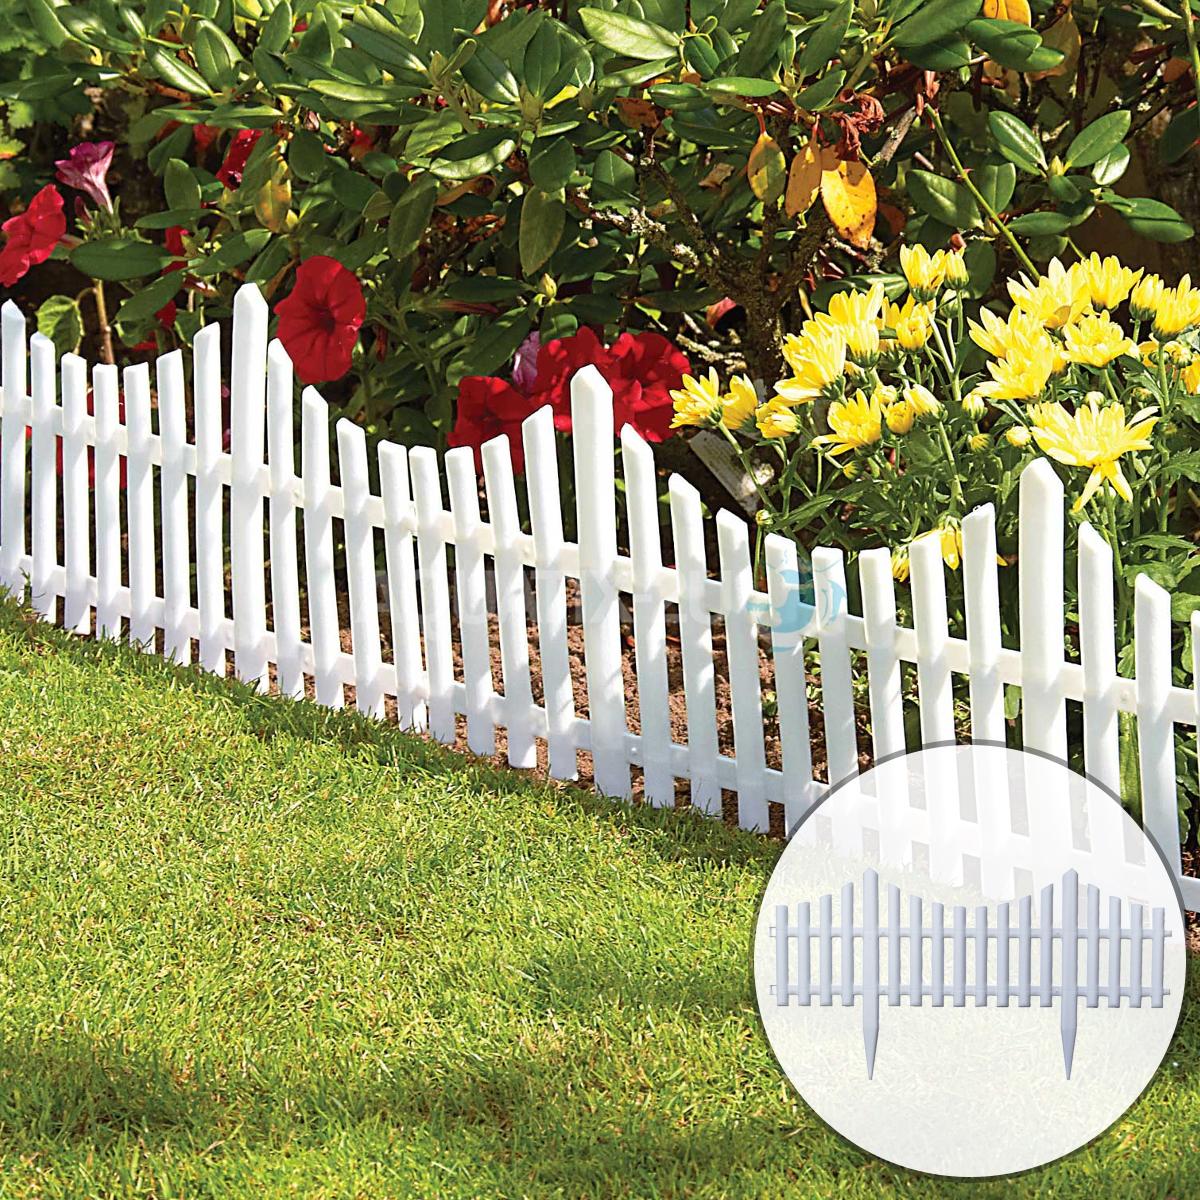 Simple Picket Fence: FLEXIBLE INTERLOCKING WHITE PLASTIC PICKET GARDEN FENCE